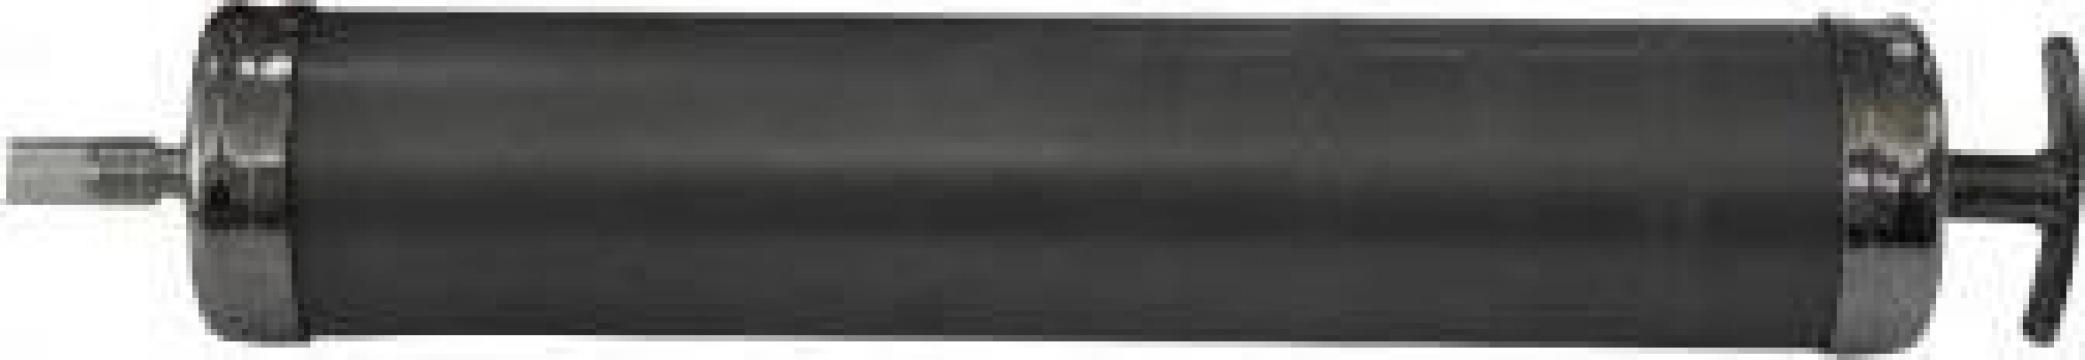 Pompa manuala de ulei- ZK-556 - 500ml de la Zimber Tools